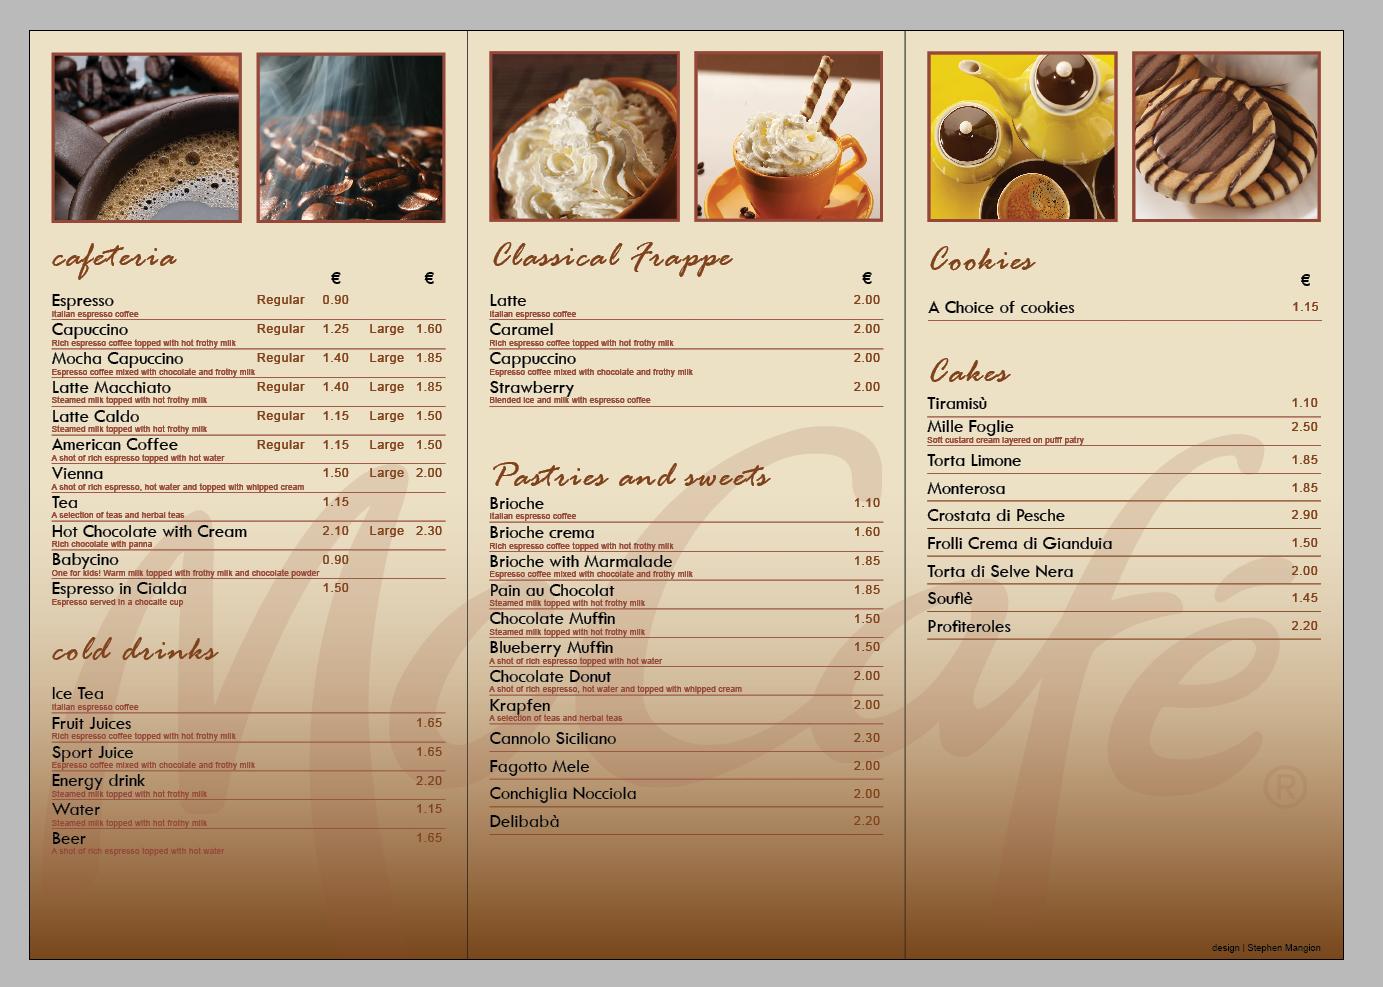 mccafe menu design inlay by mangion on deviantart